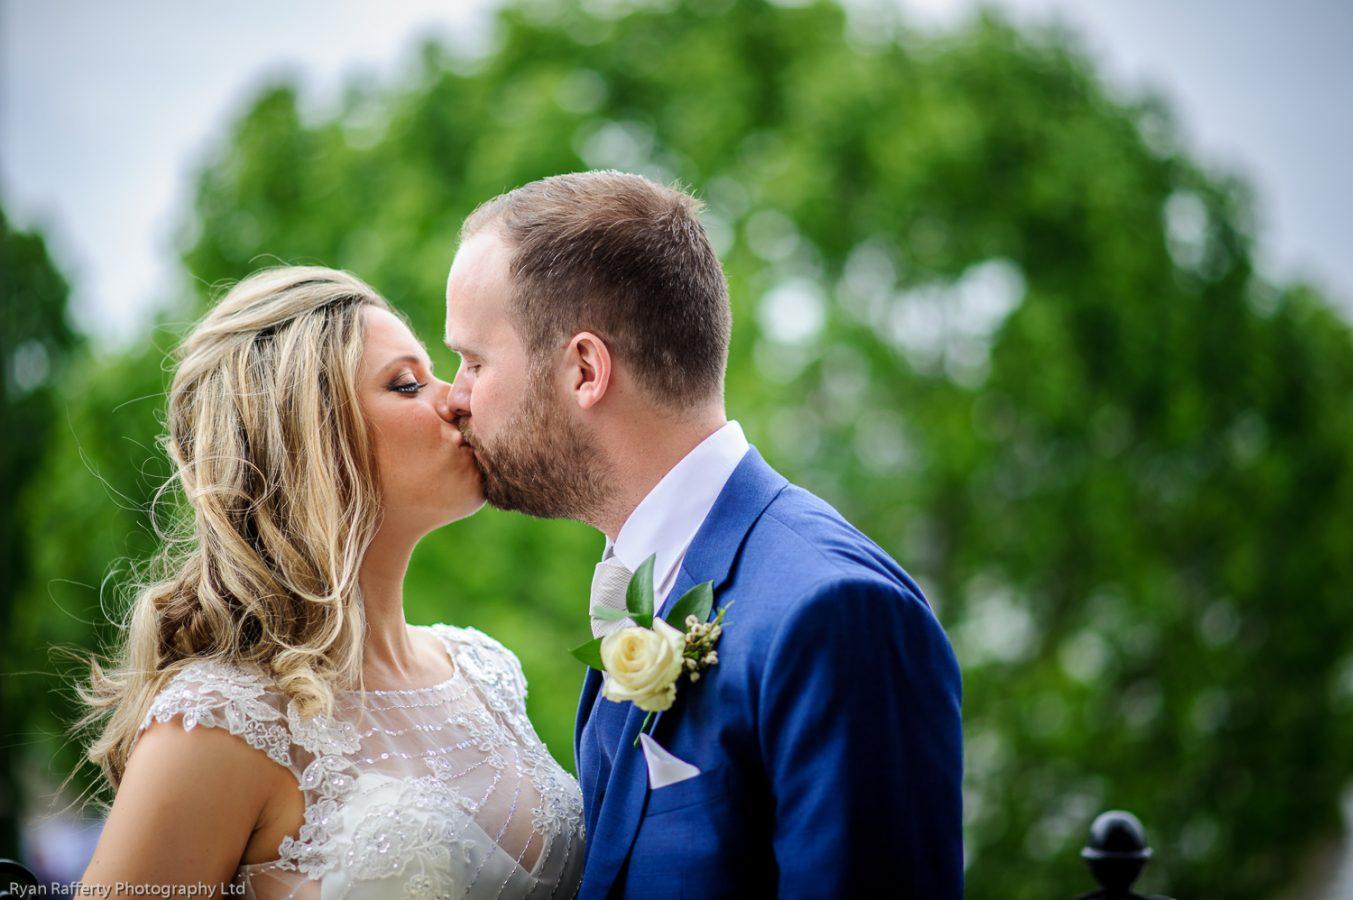 Swan-at-shakespeare-globe-wedding-photography-131